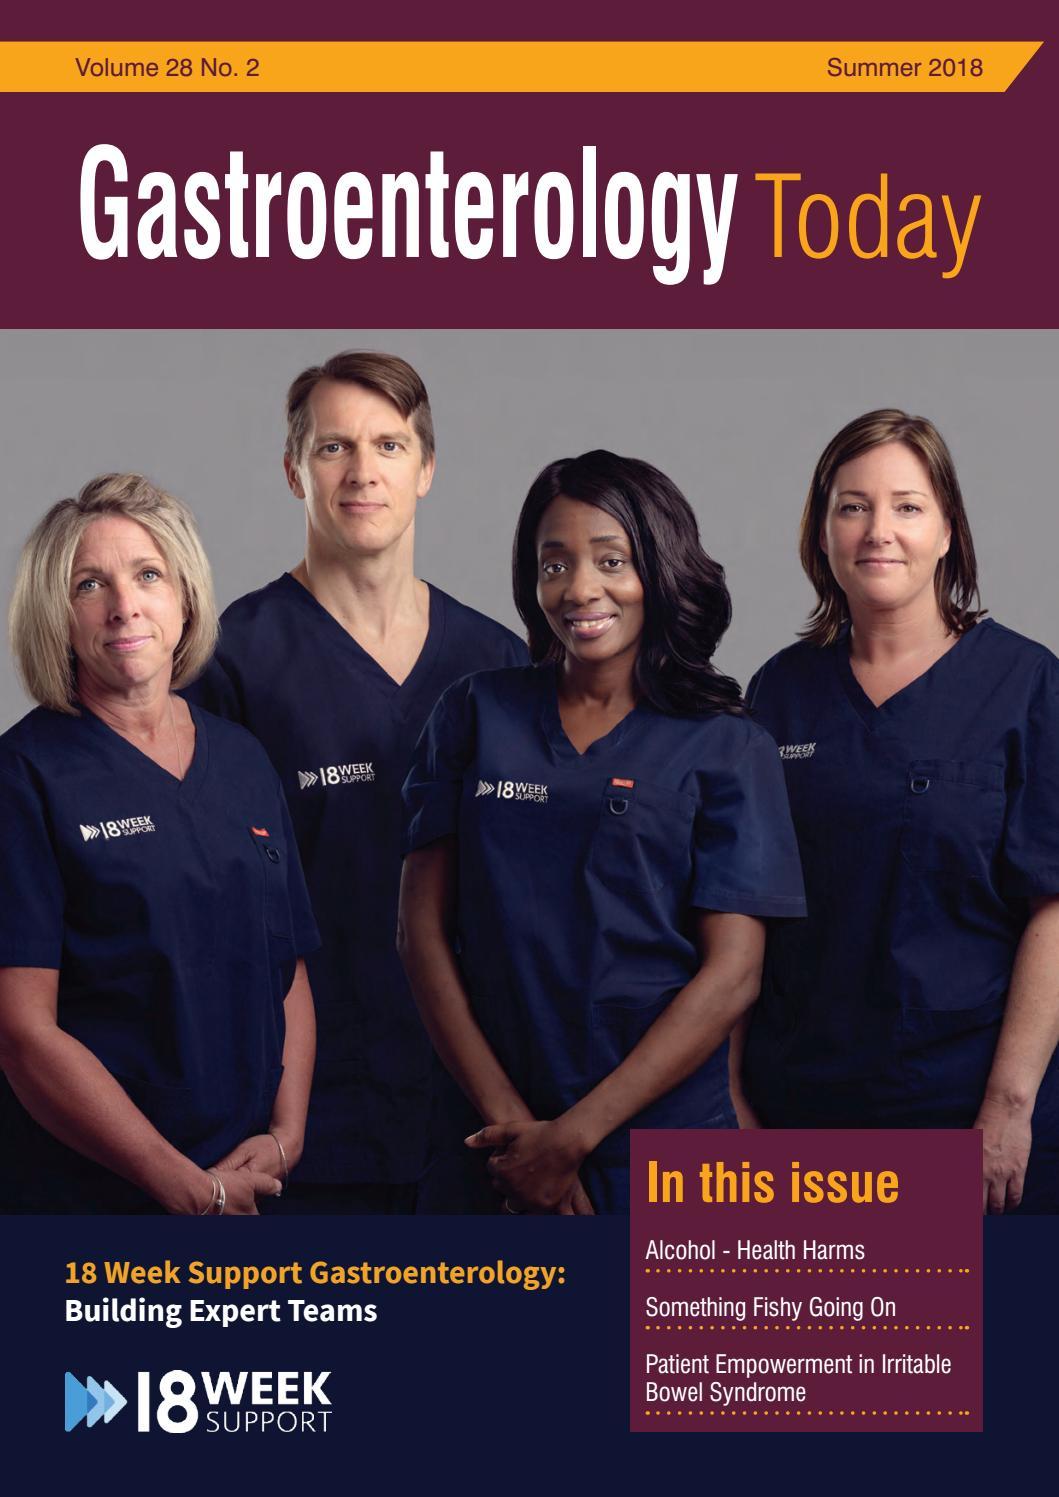 Gastroenterology Today Summer 2018 by Media Publishing